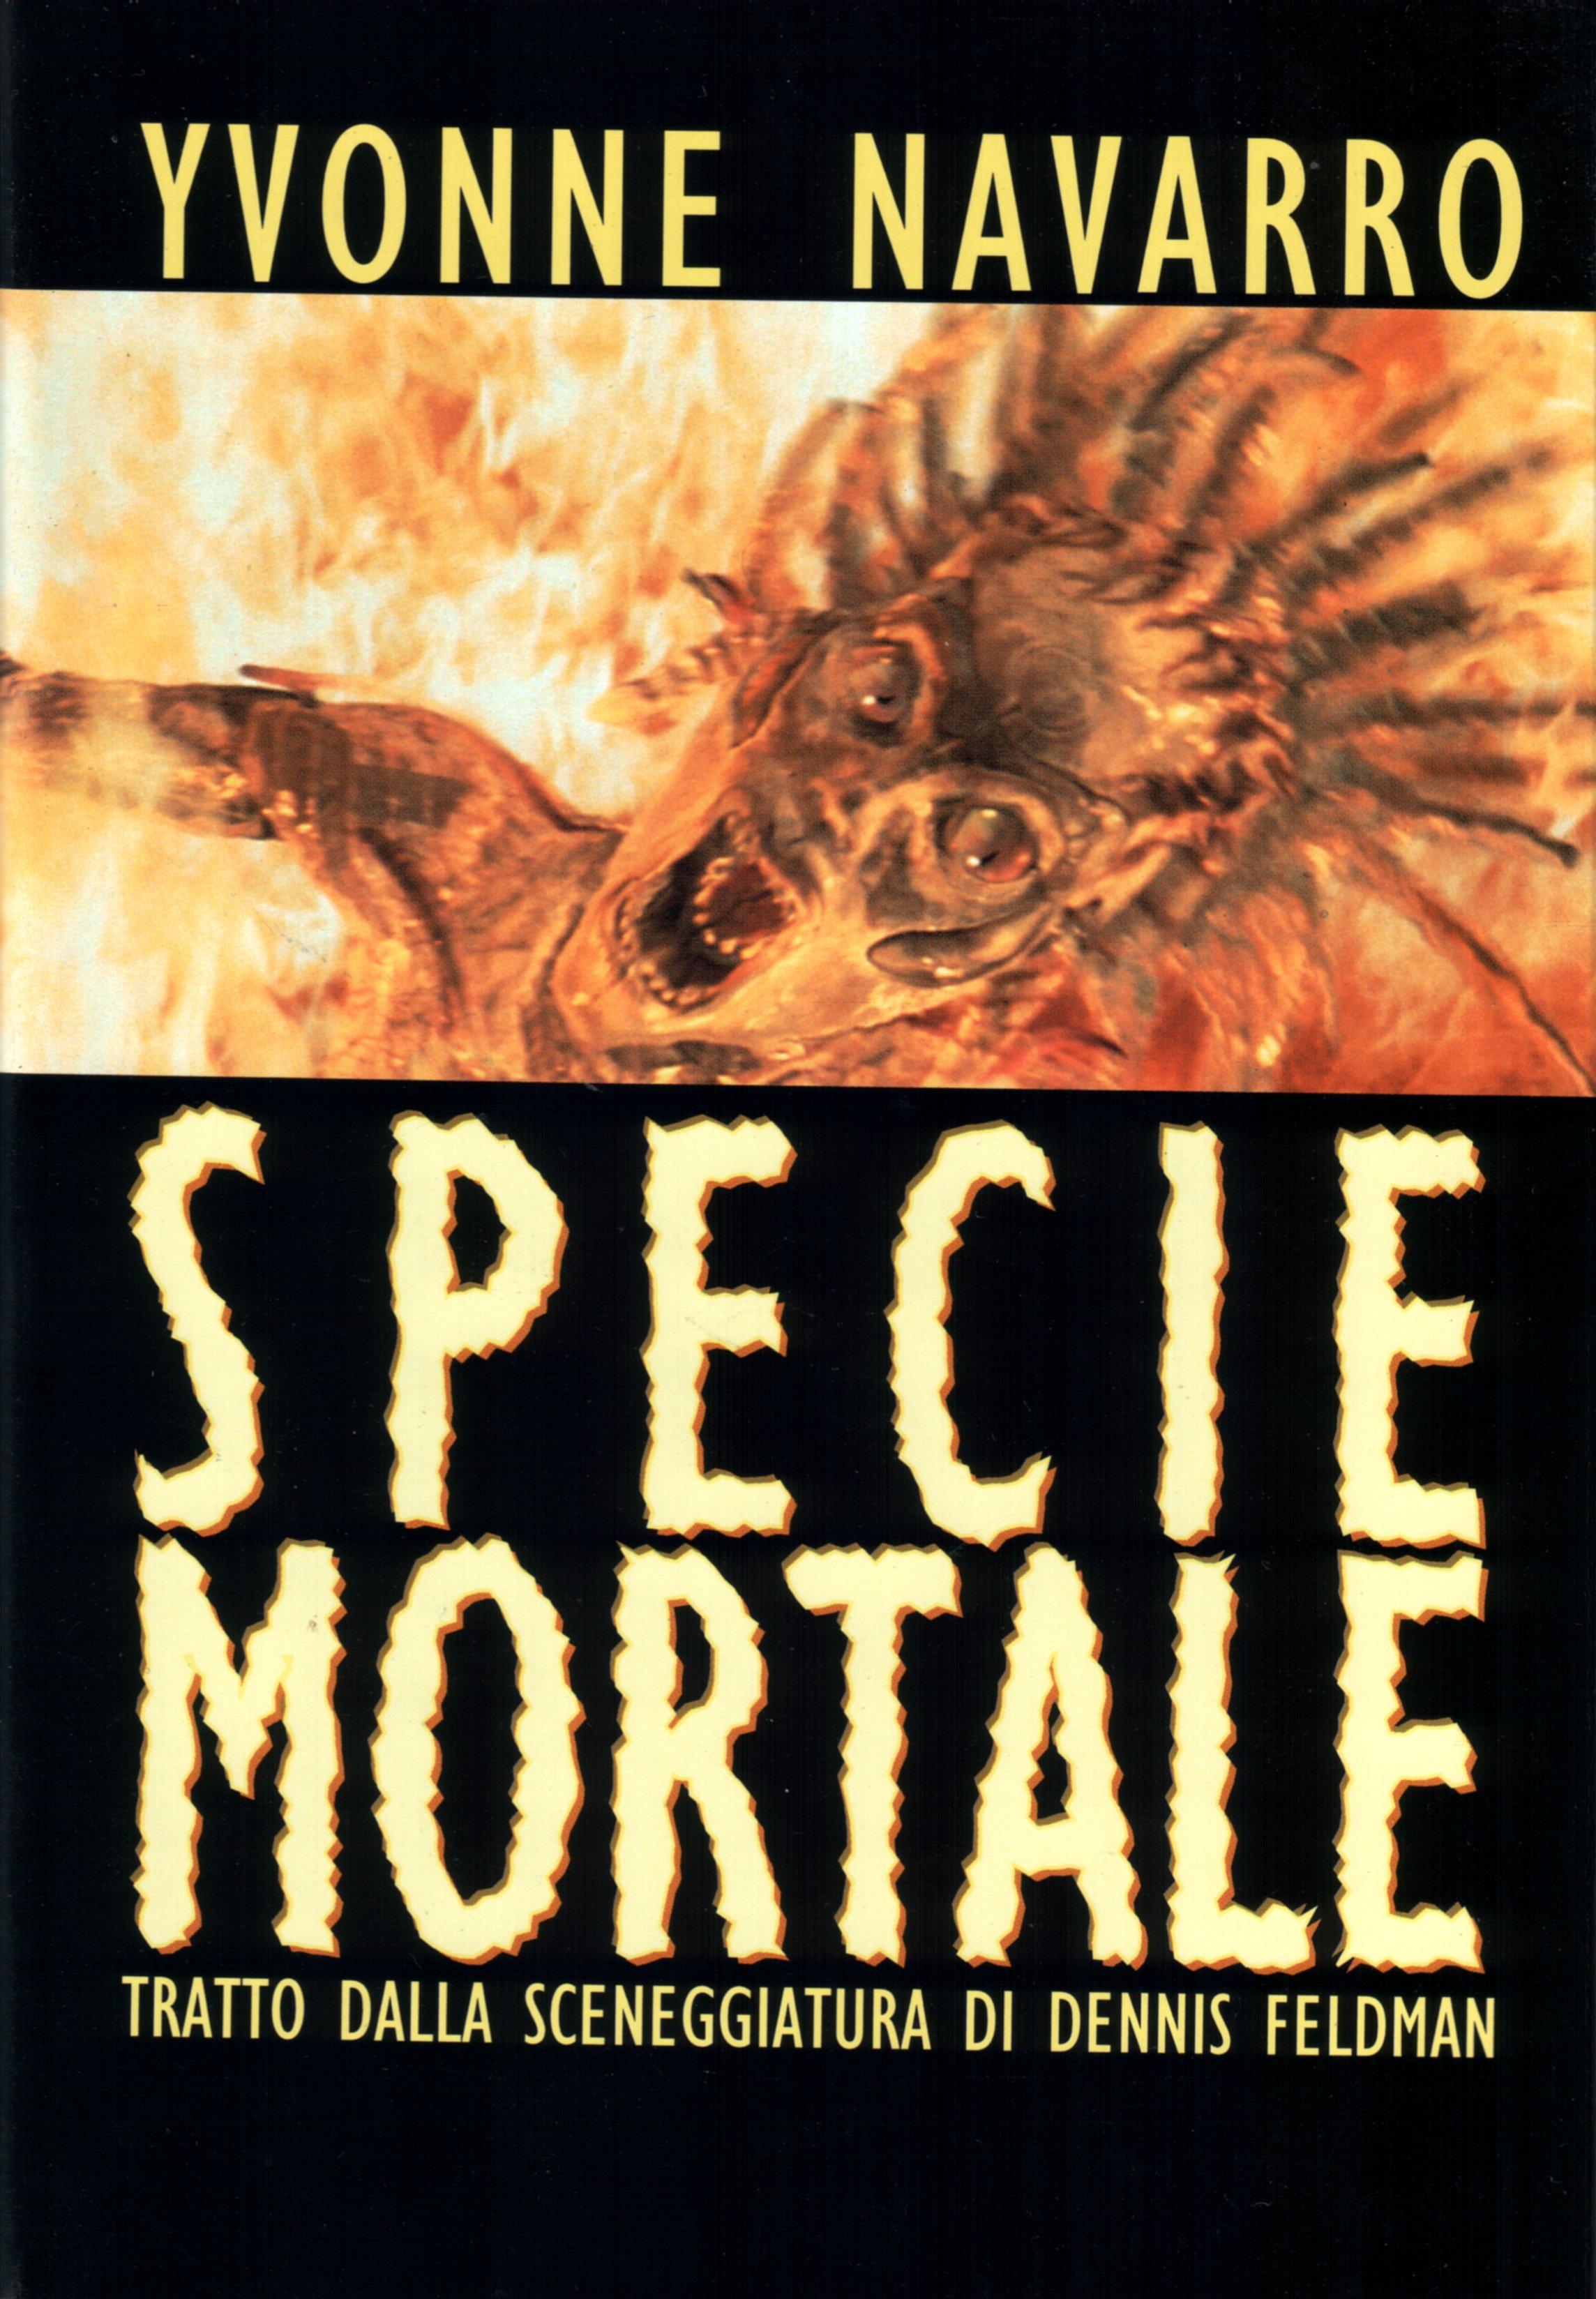 Specie mortale